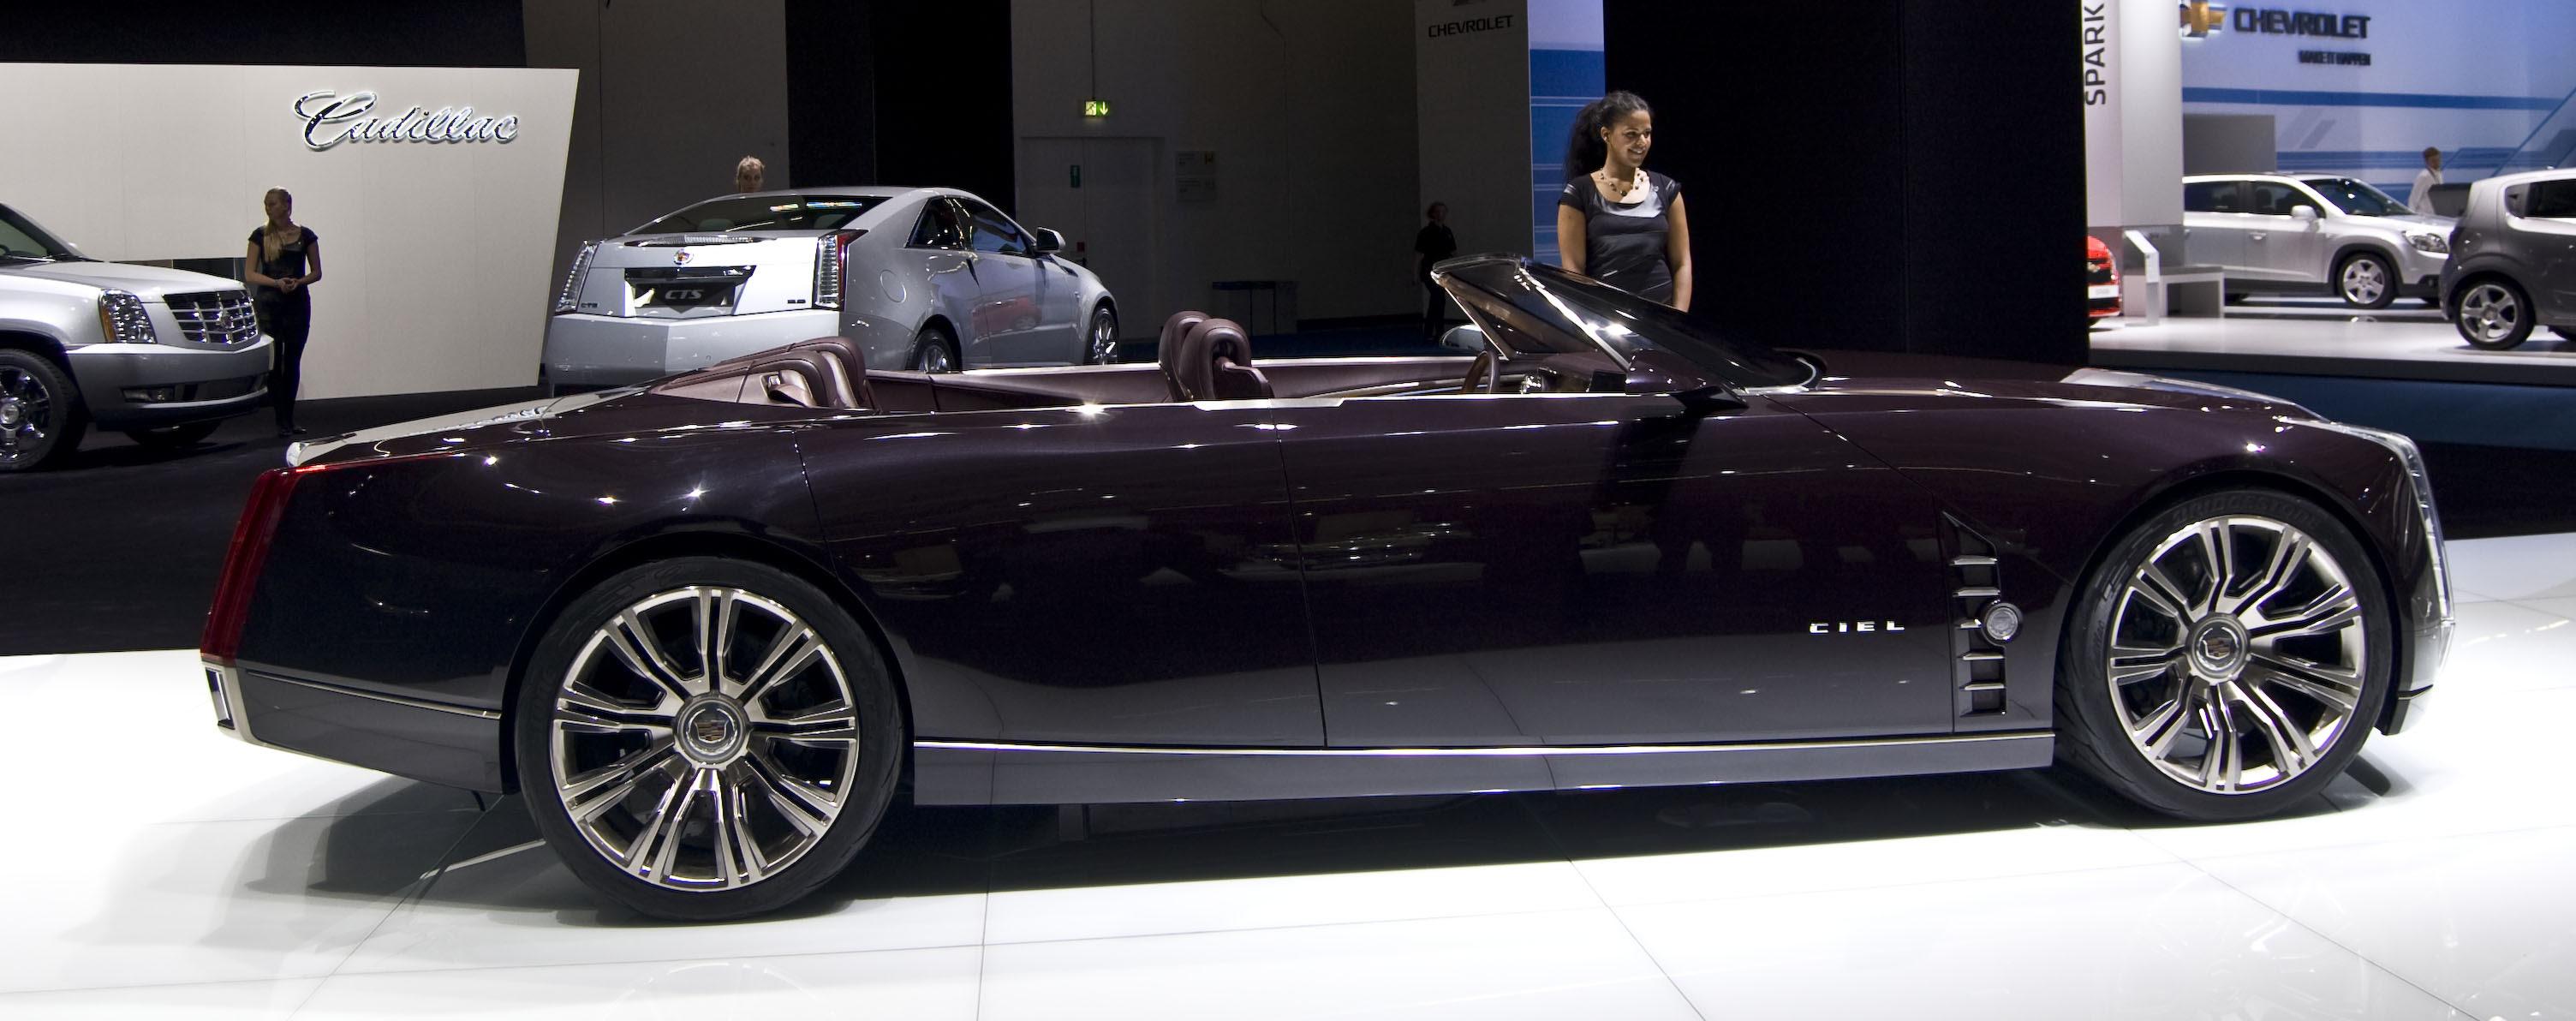 Cadillac Concept Ciel File:cadillac ciel concept